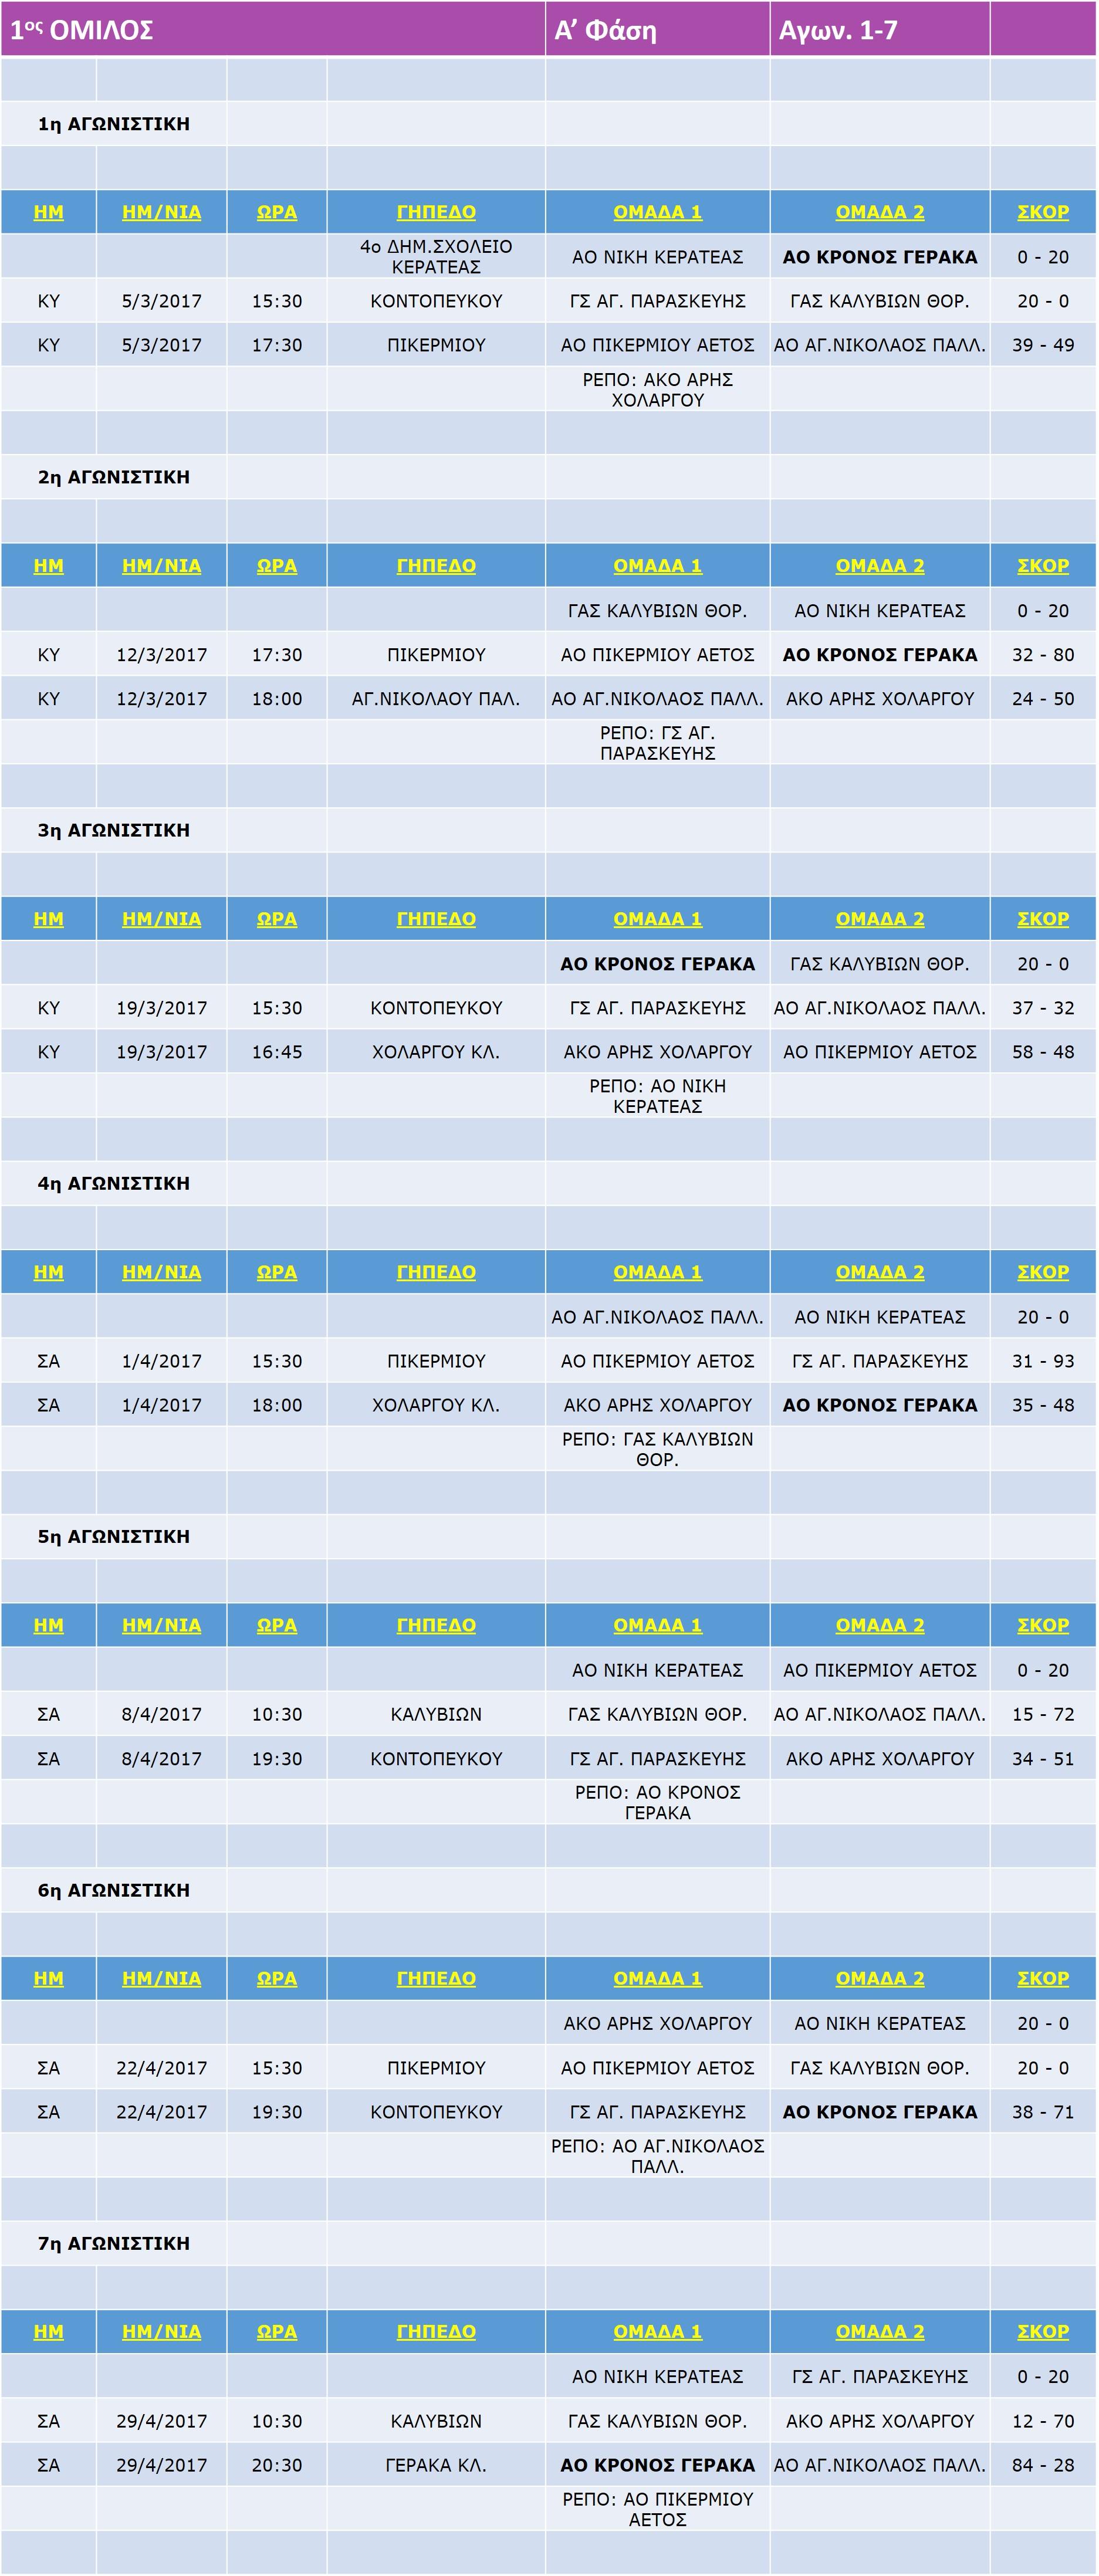 Pagkorasides_Match_1-7_7